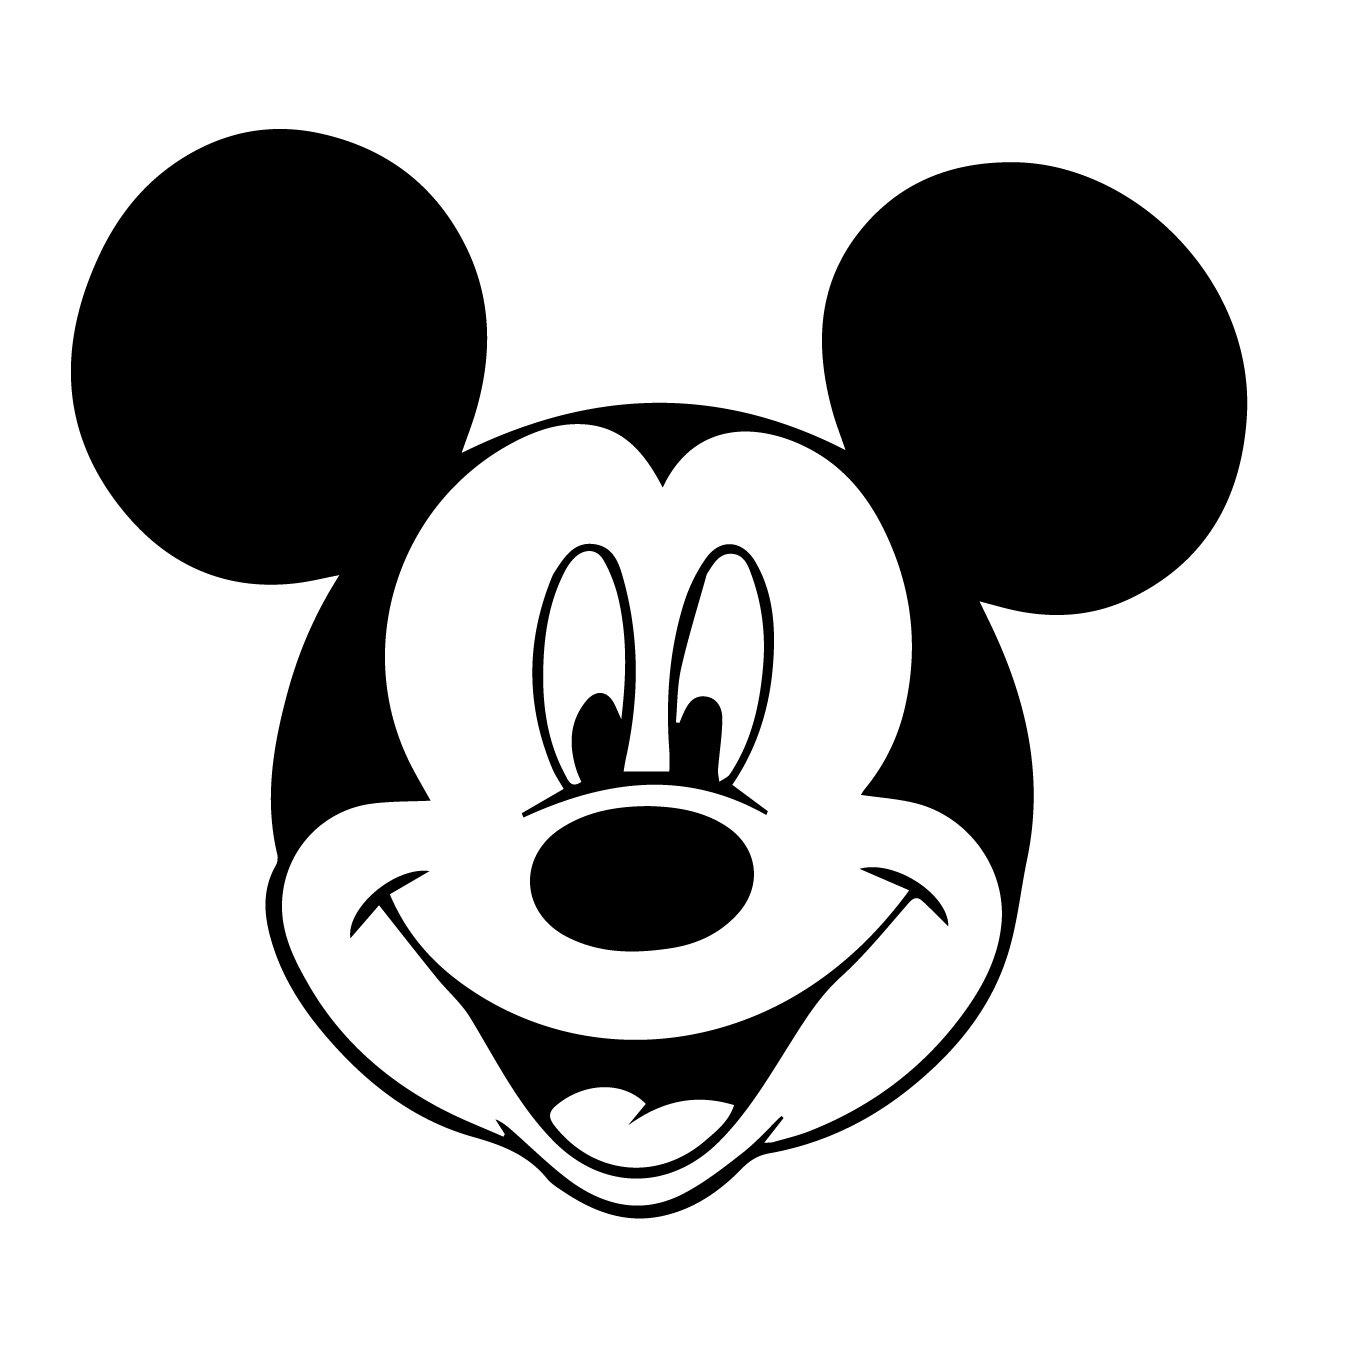 1349x1346 Mickey Mouse Svgwalt Disney Eps Mickey Mouse